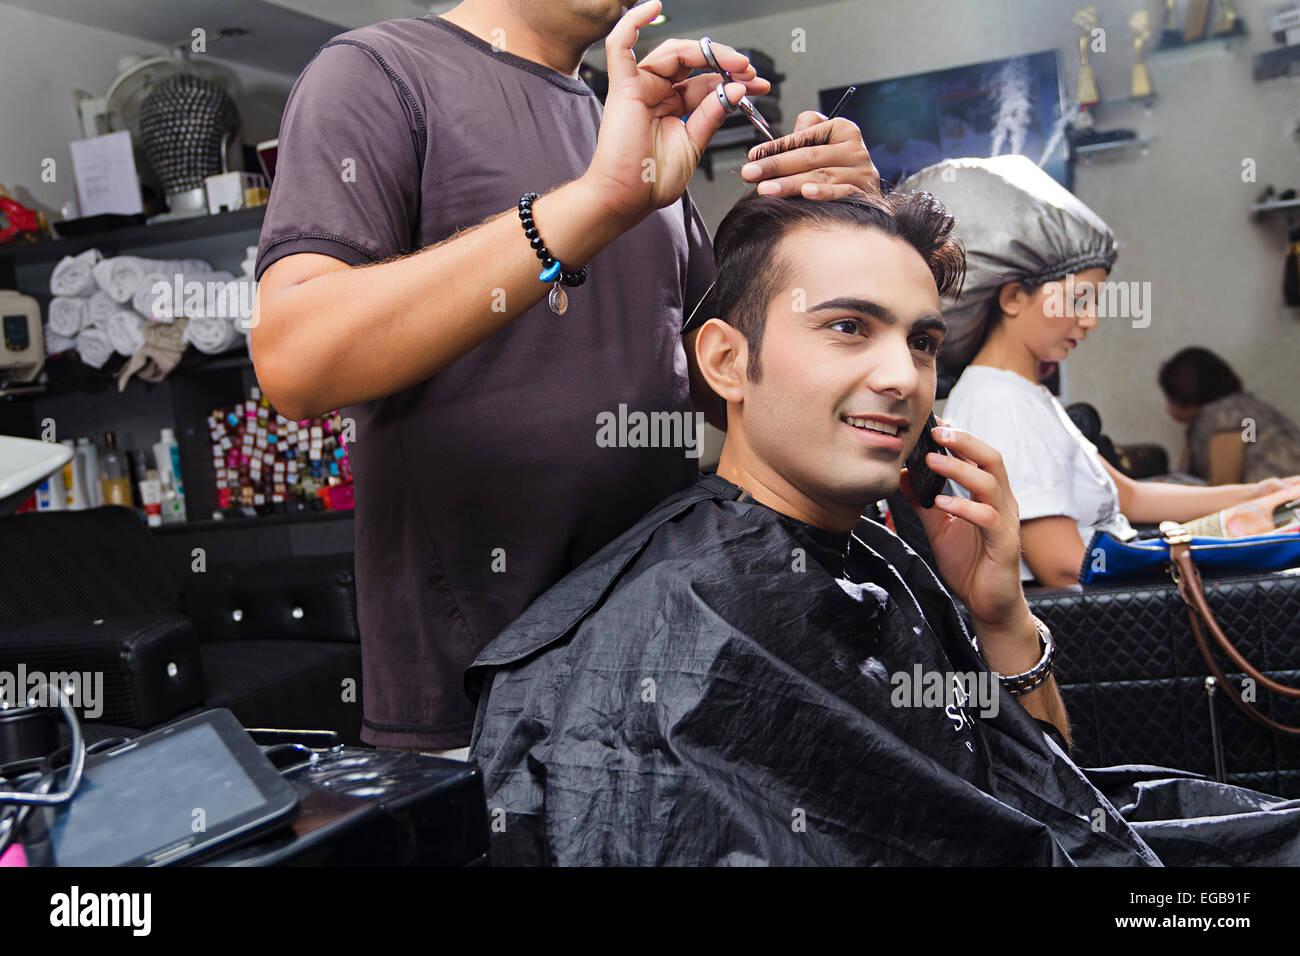 12 indian people Hairdresser Cutting Saloon talking phone Stock